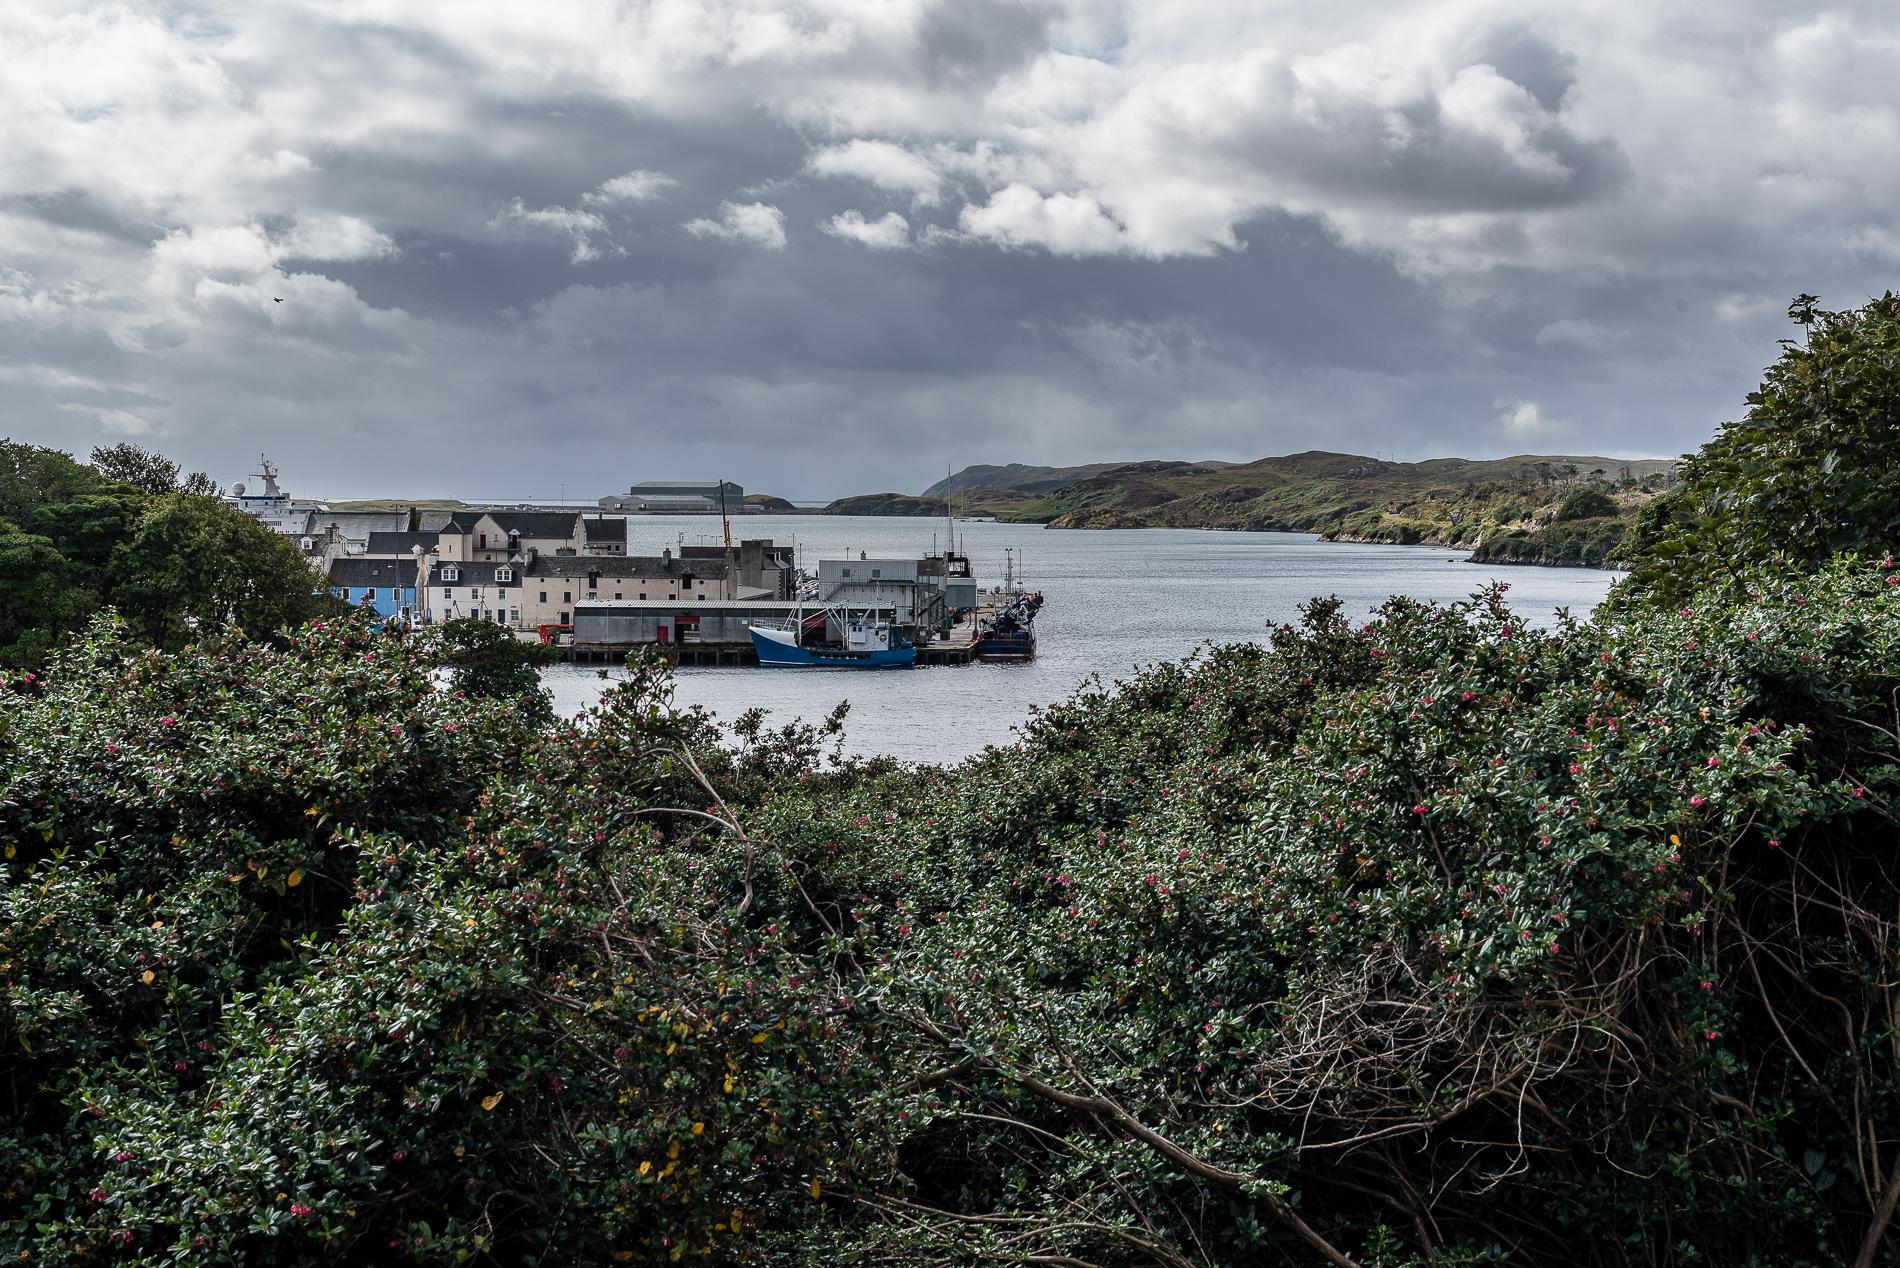 Stornoway, Outer Hebrides, Scotland